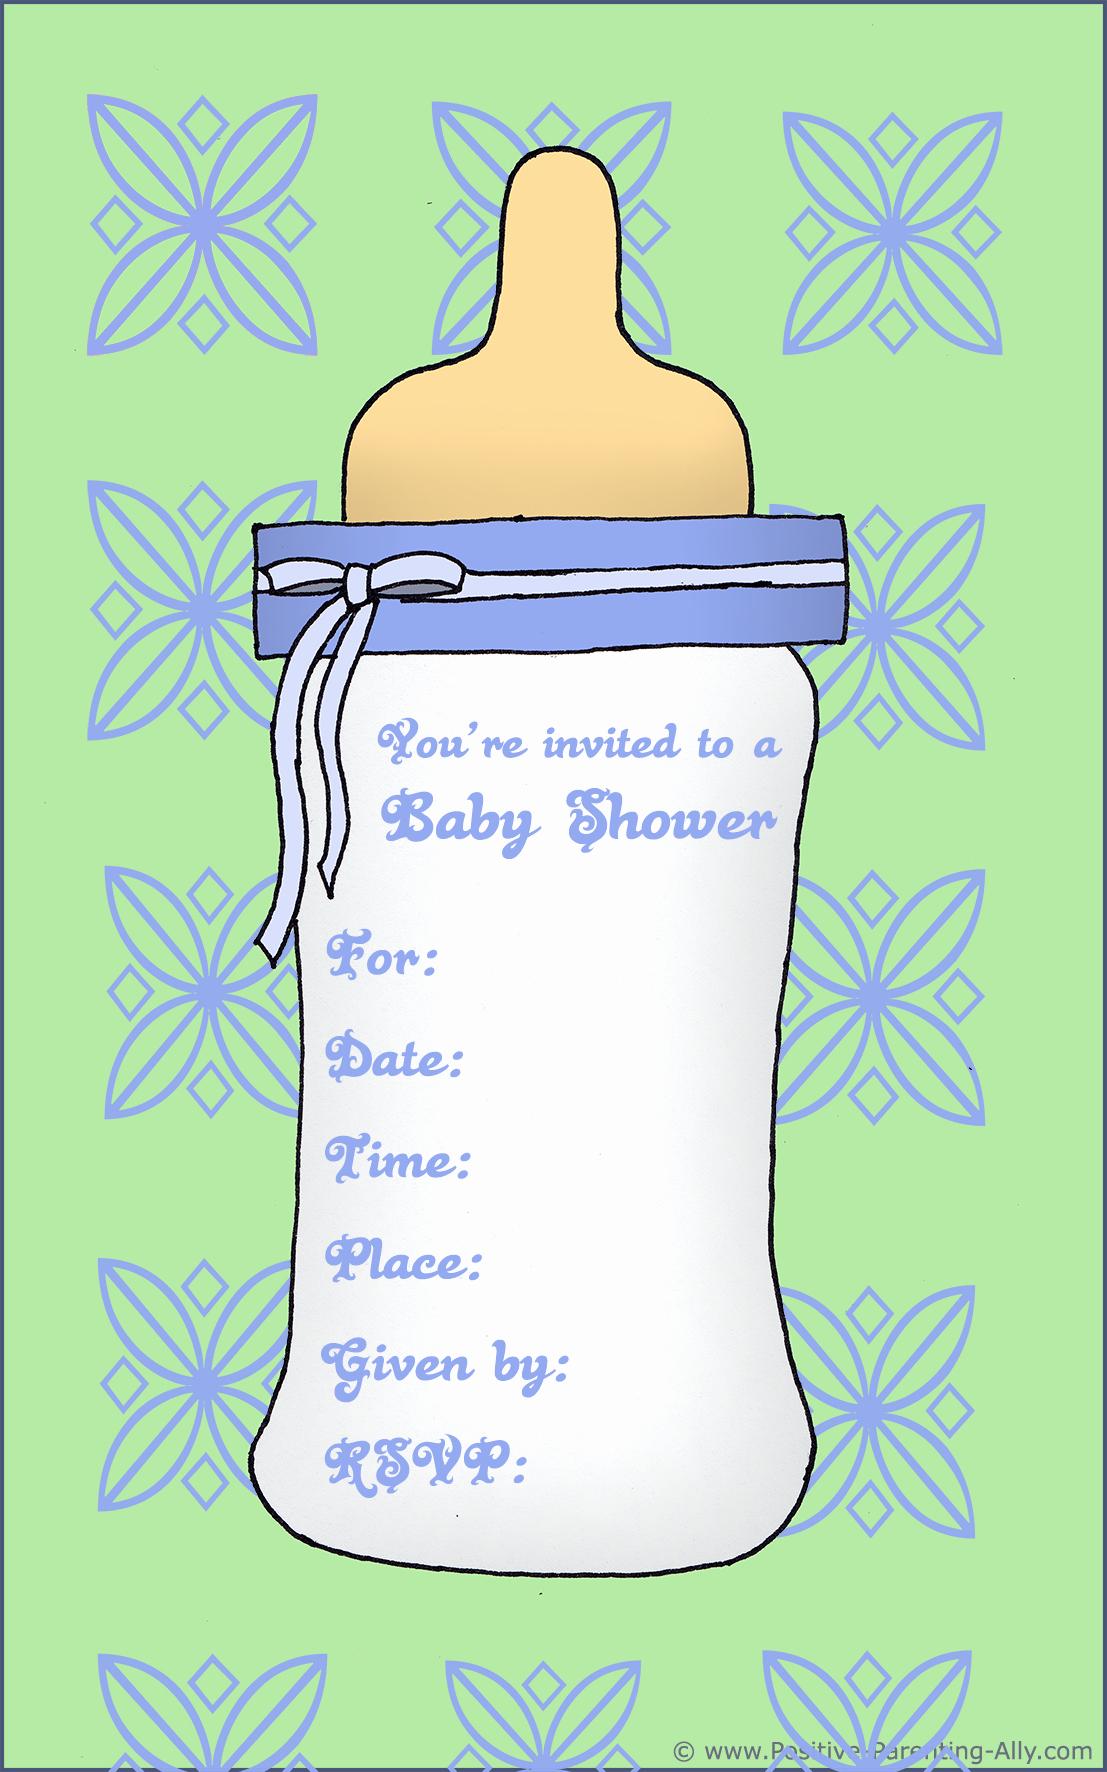 Baby Shower Invitation Free Printable New Free Printable Baby Shower Invitations In High Quality